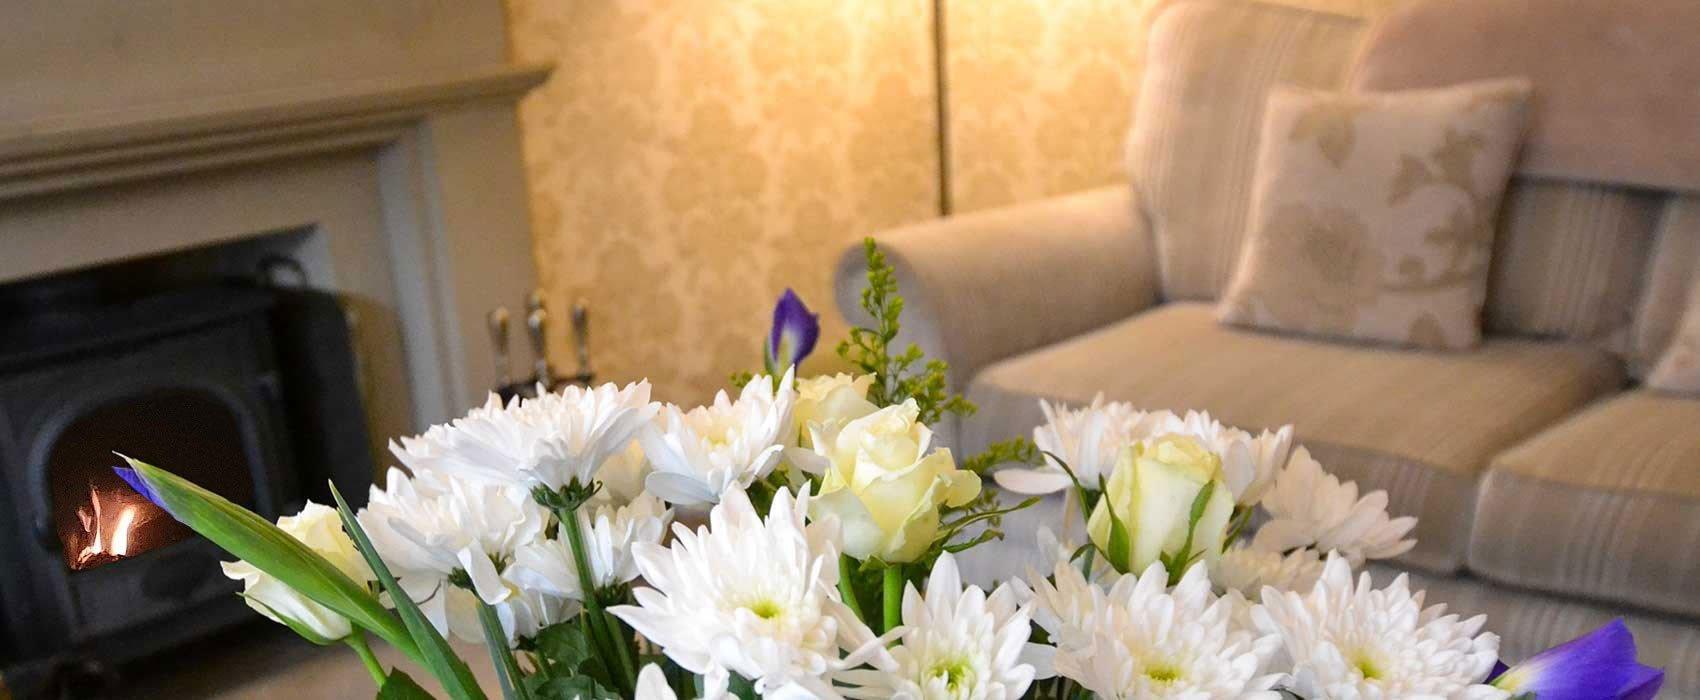 Sitting-room-flowers-fire